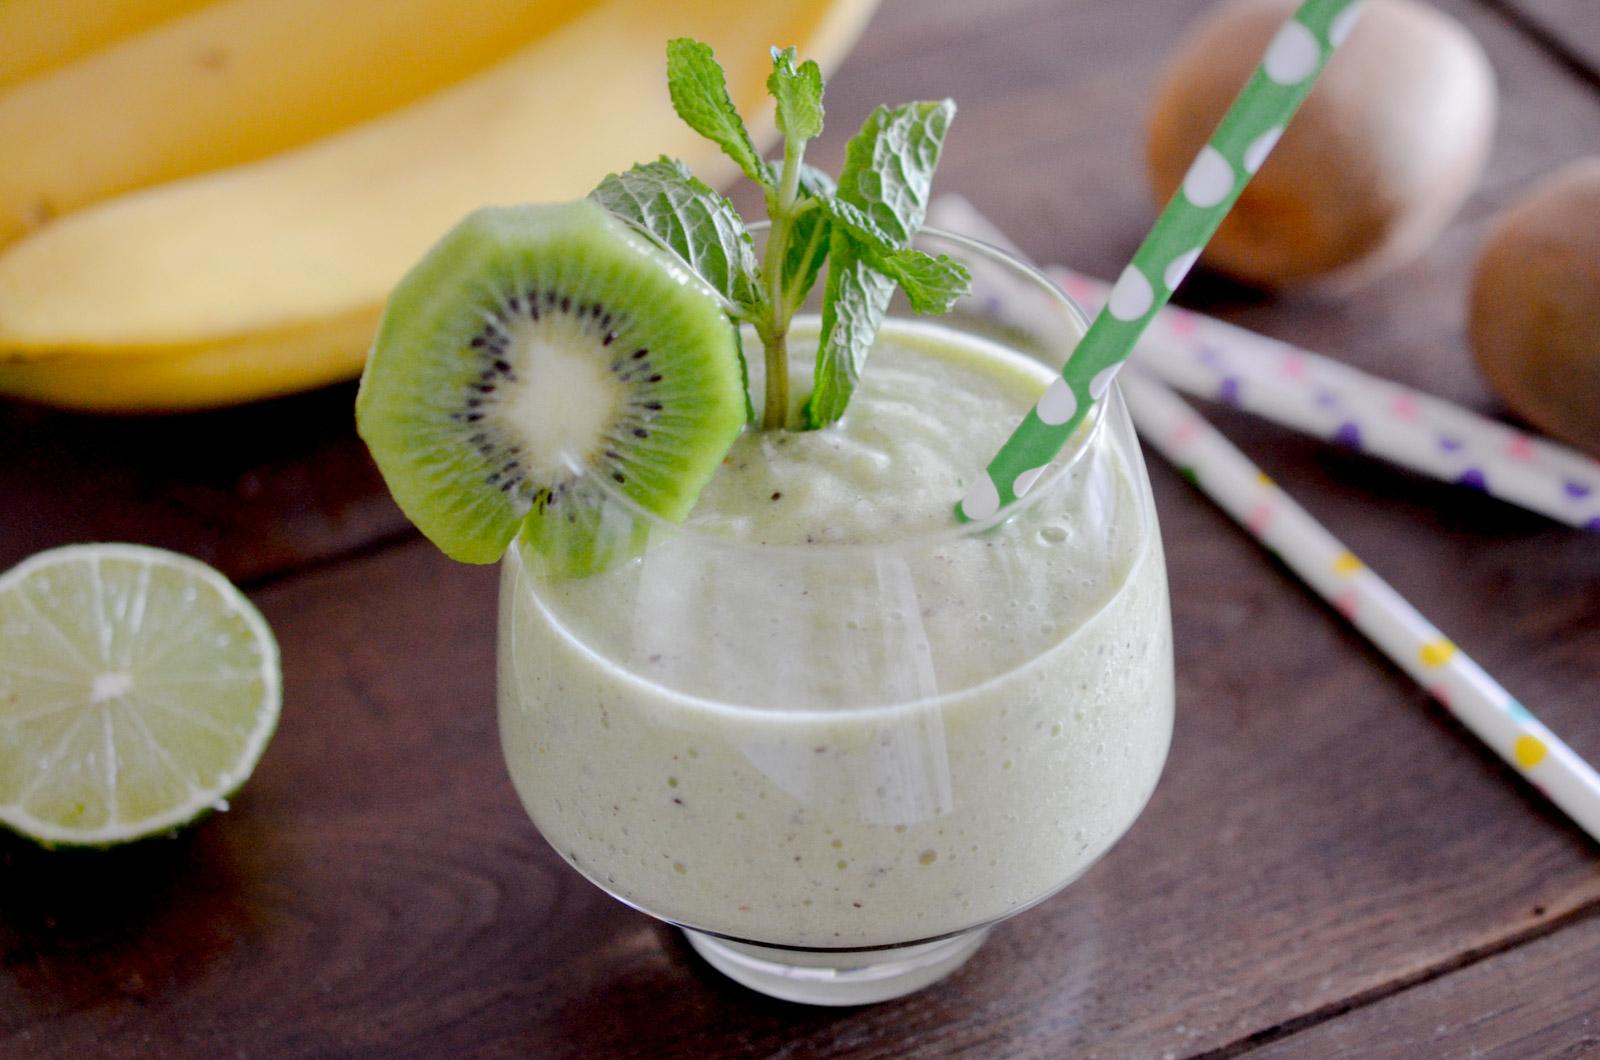 Smoothie Banane Kiwi Citron Vert 1 Sur 3